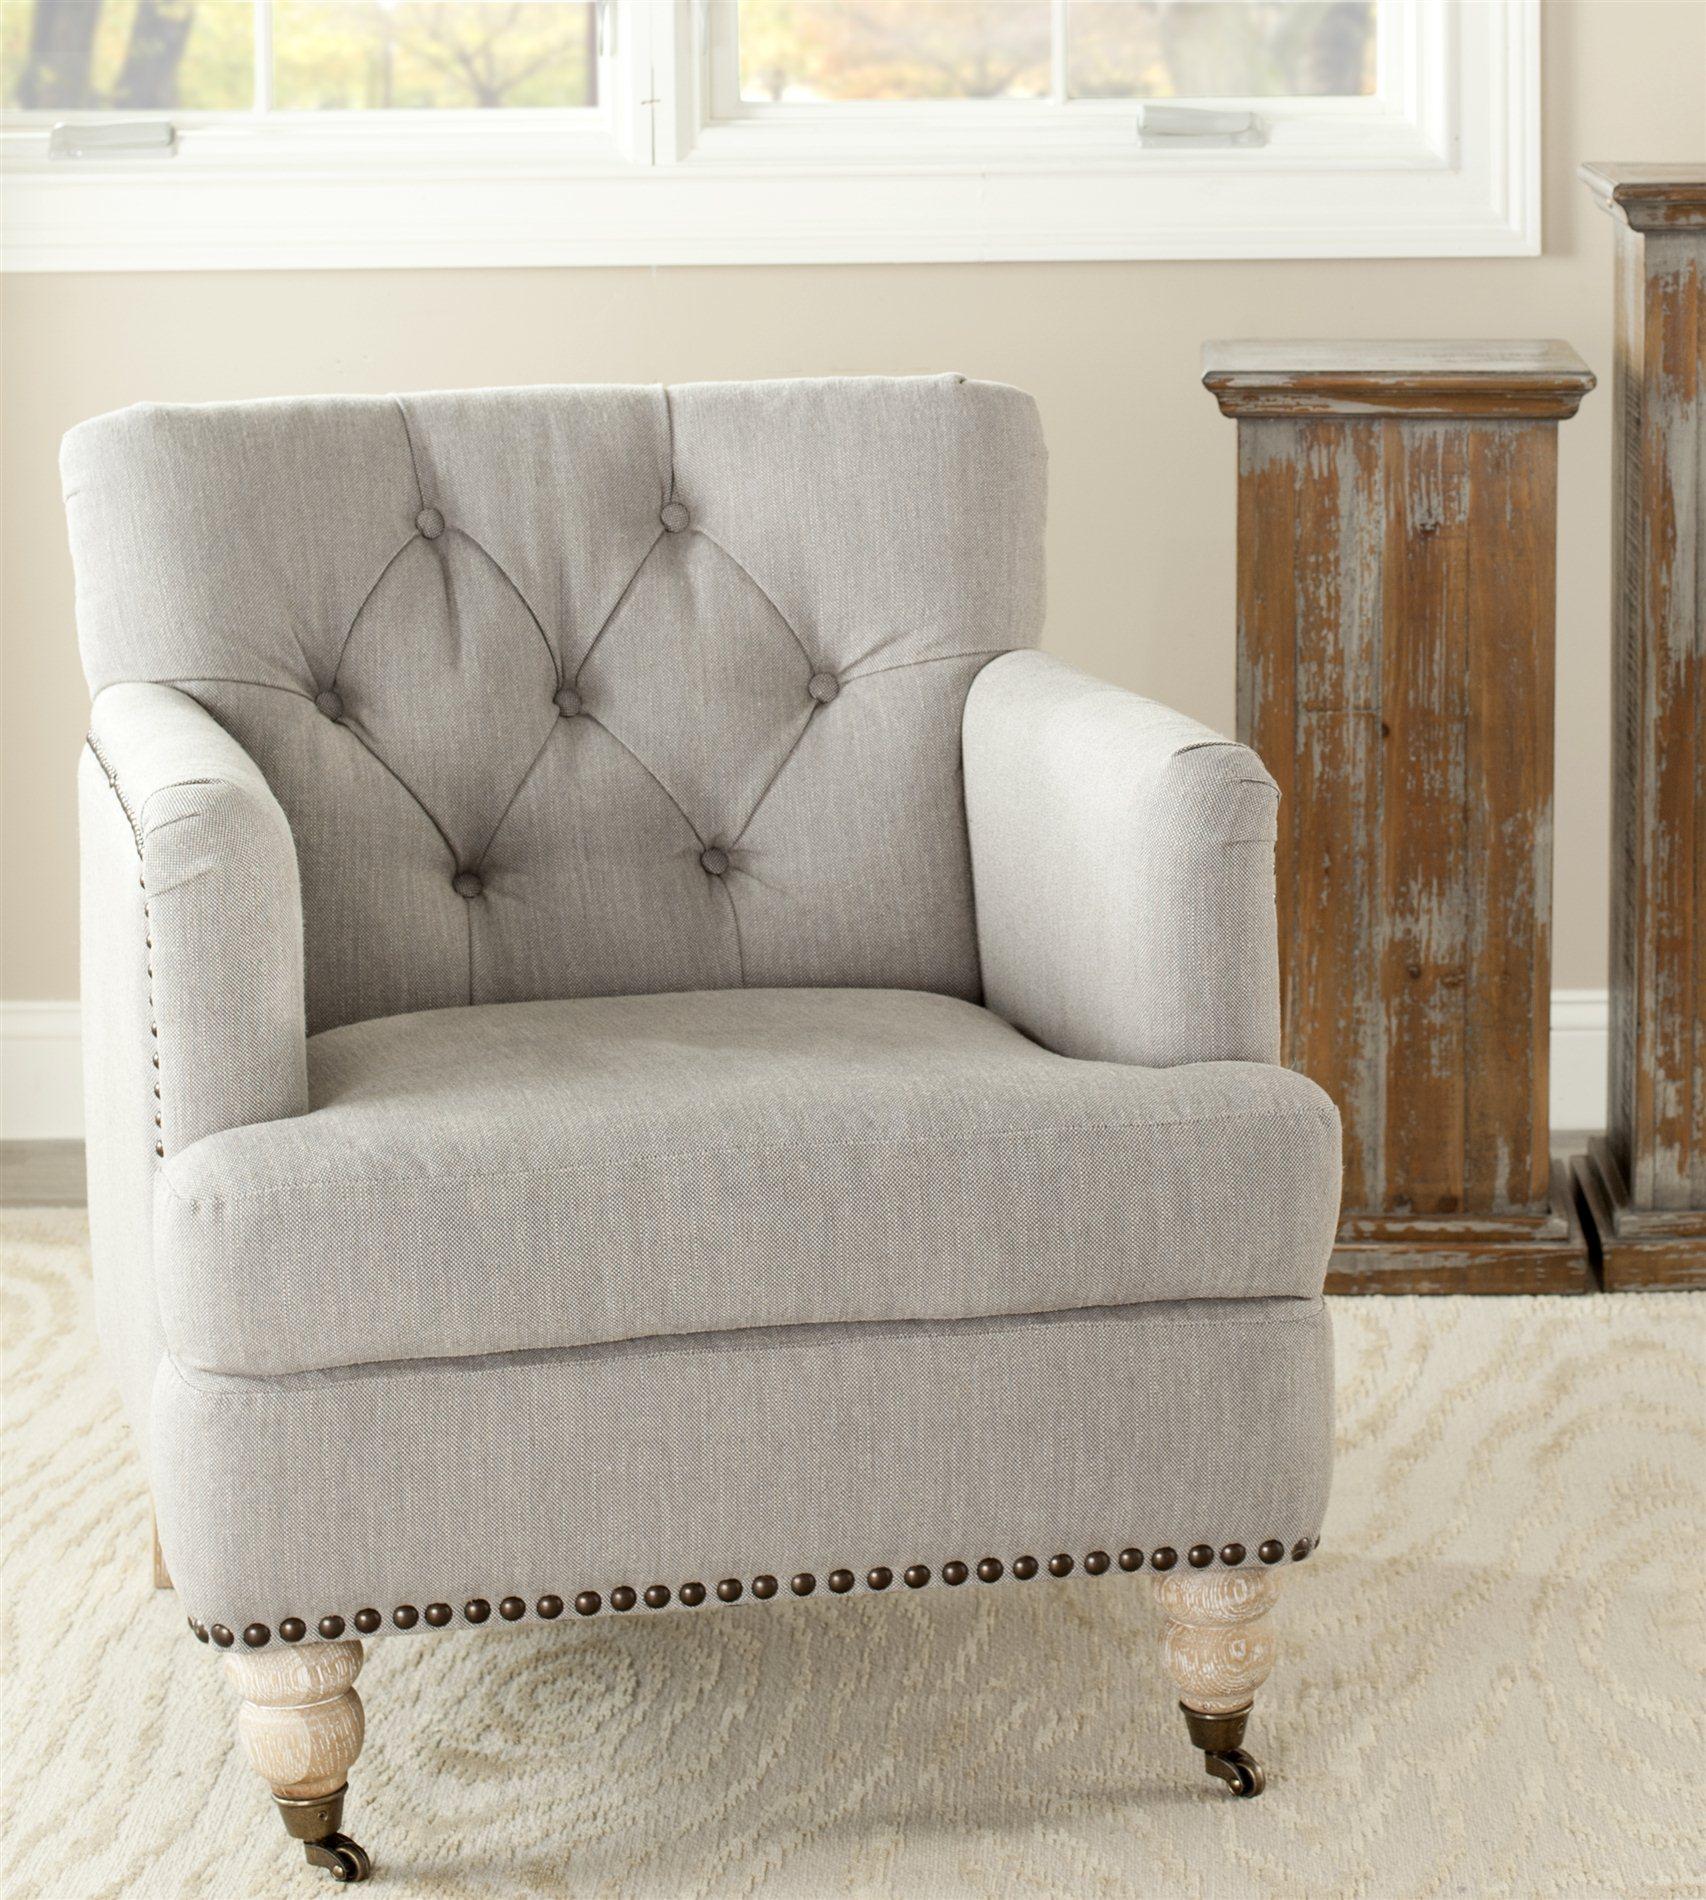 safavieh colin tufted club chair knee support hud8212e sfv